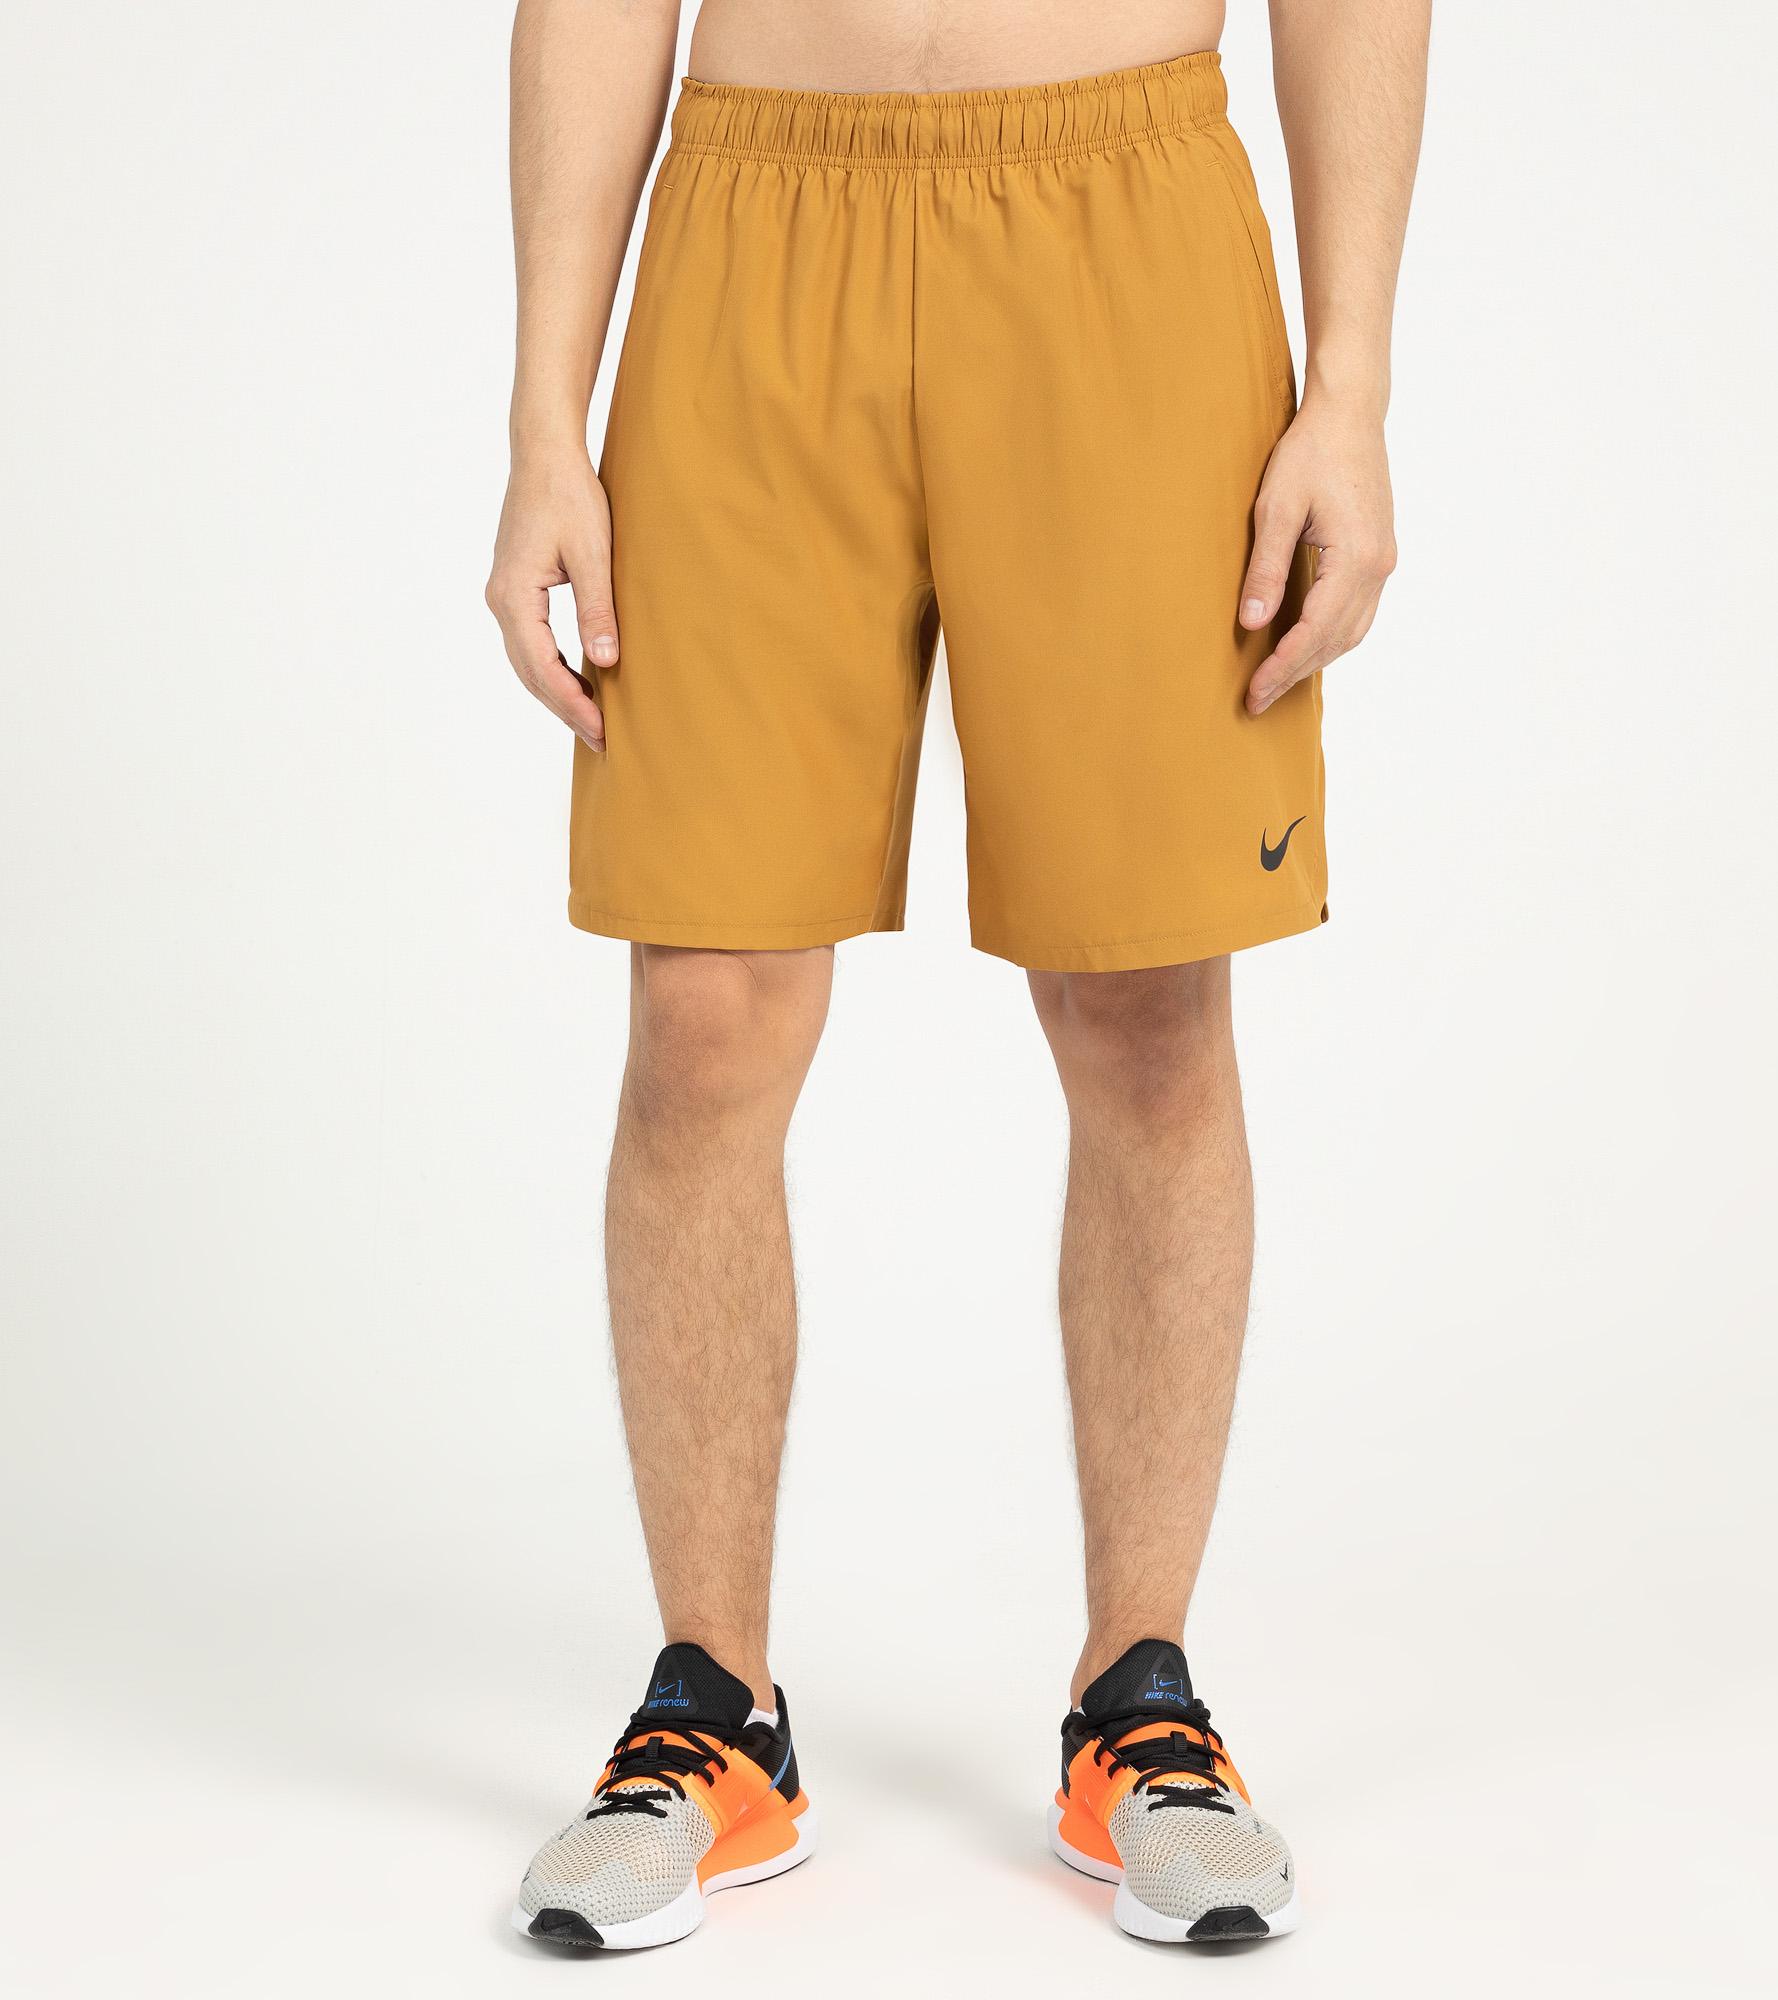 Nike Шорты мужские Nike, размер 44-46